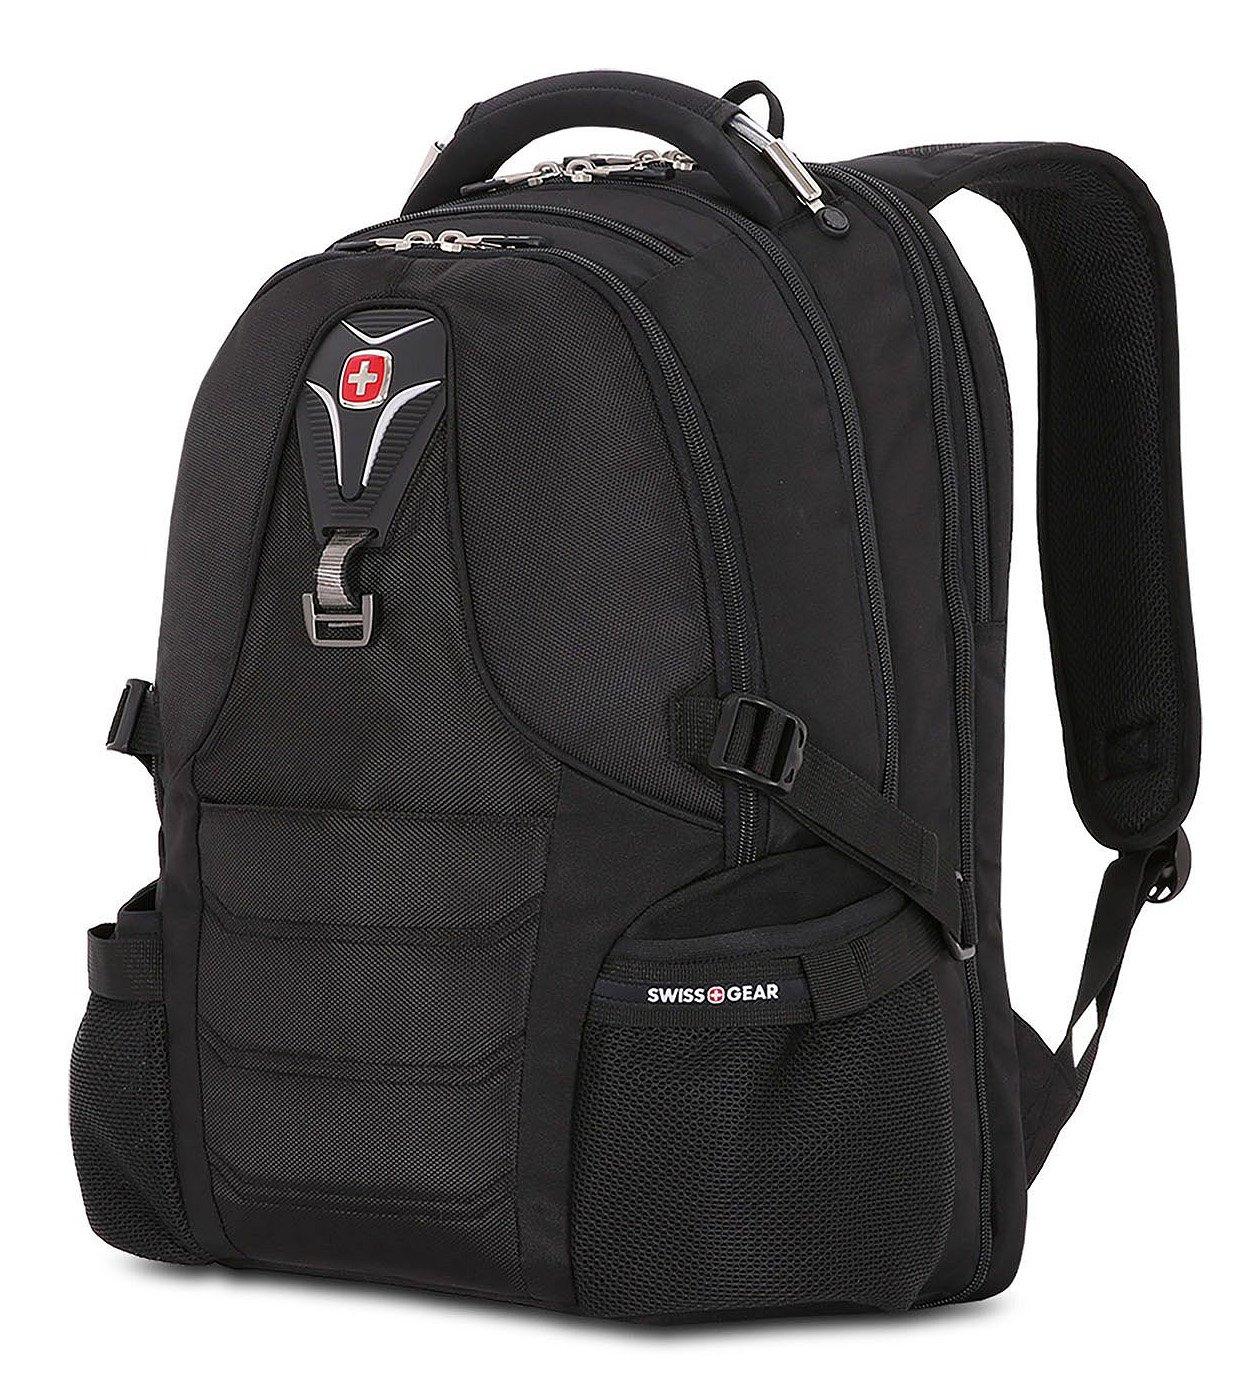 SwissGear Backpack / Bookbag ScanSmart Laptop Notebook Backpack, Fits Most 17'' Laptop Computers by Swiss Gear